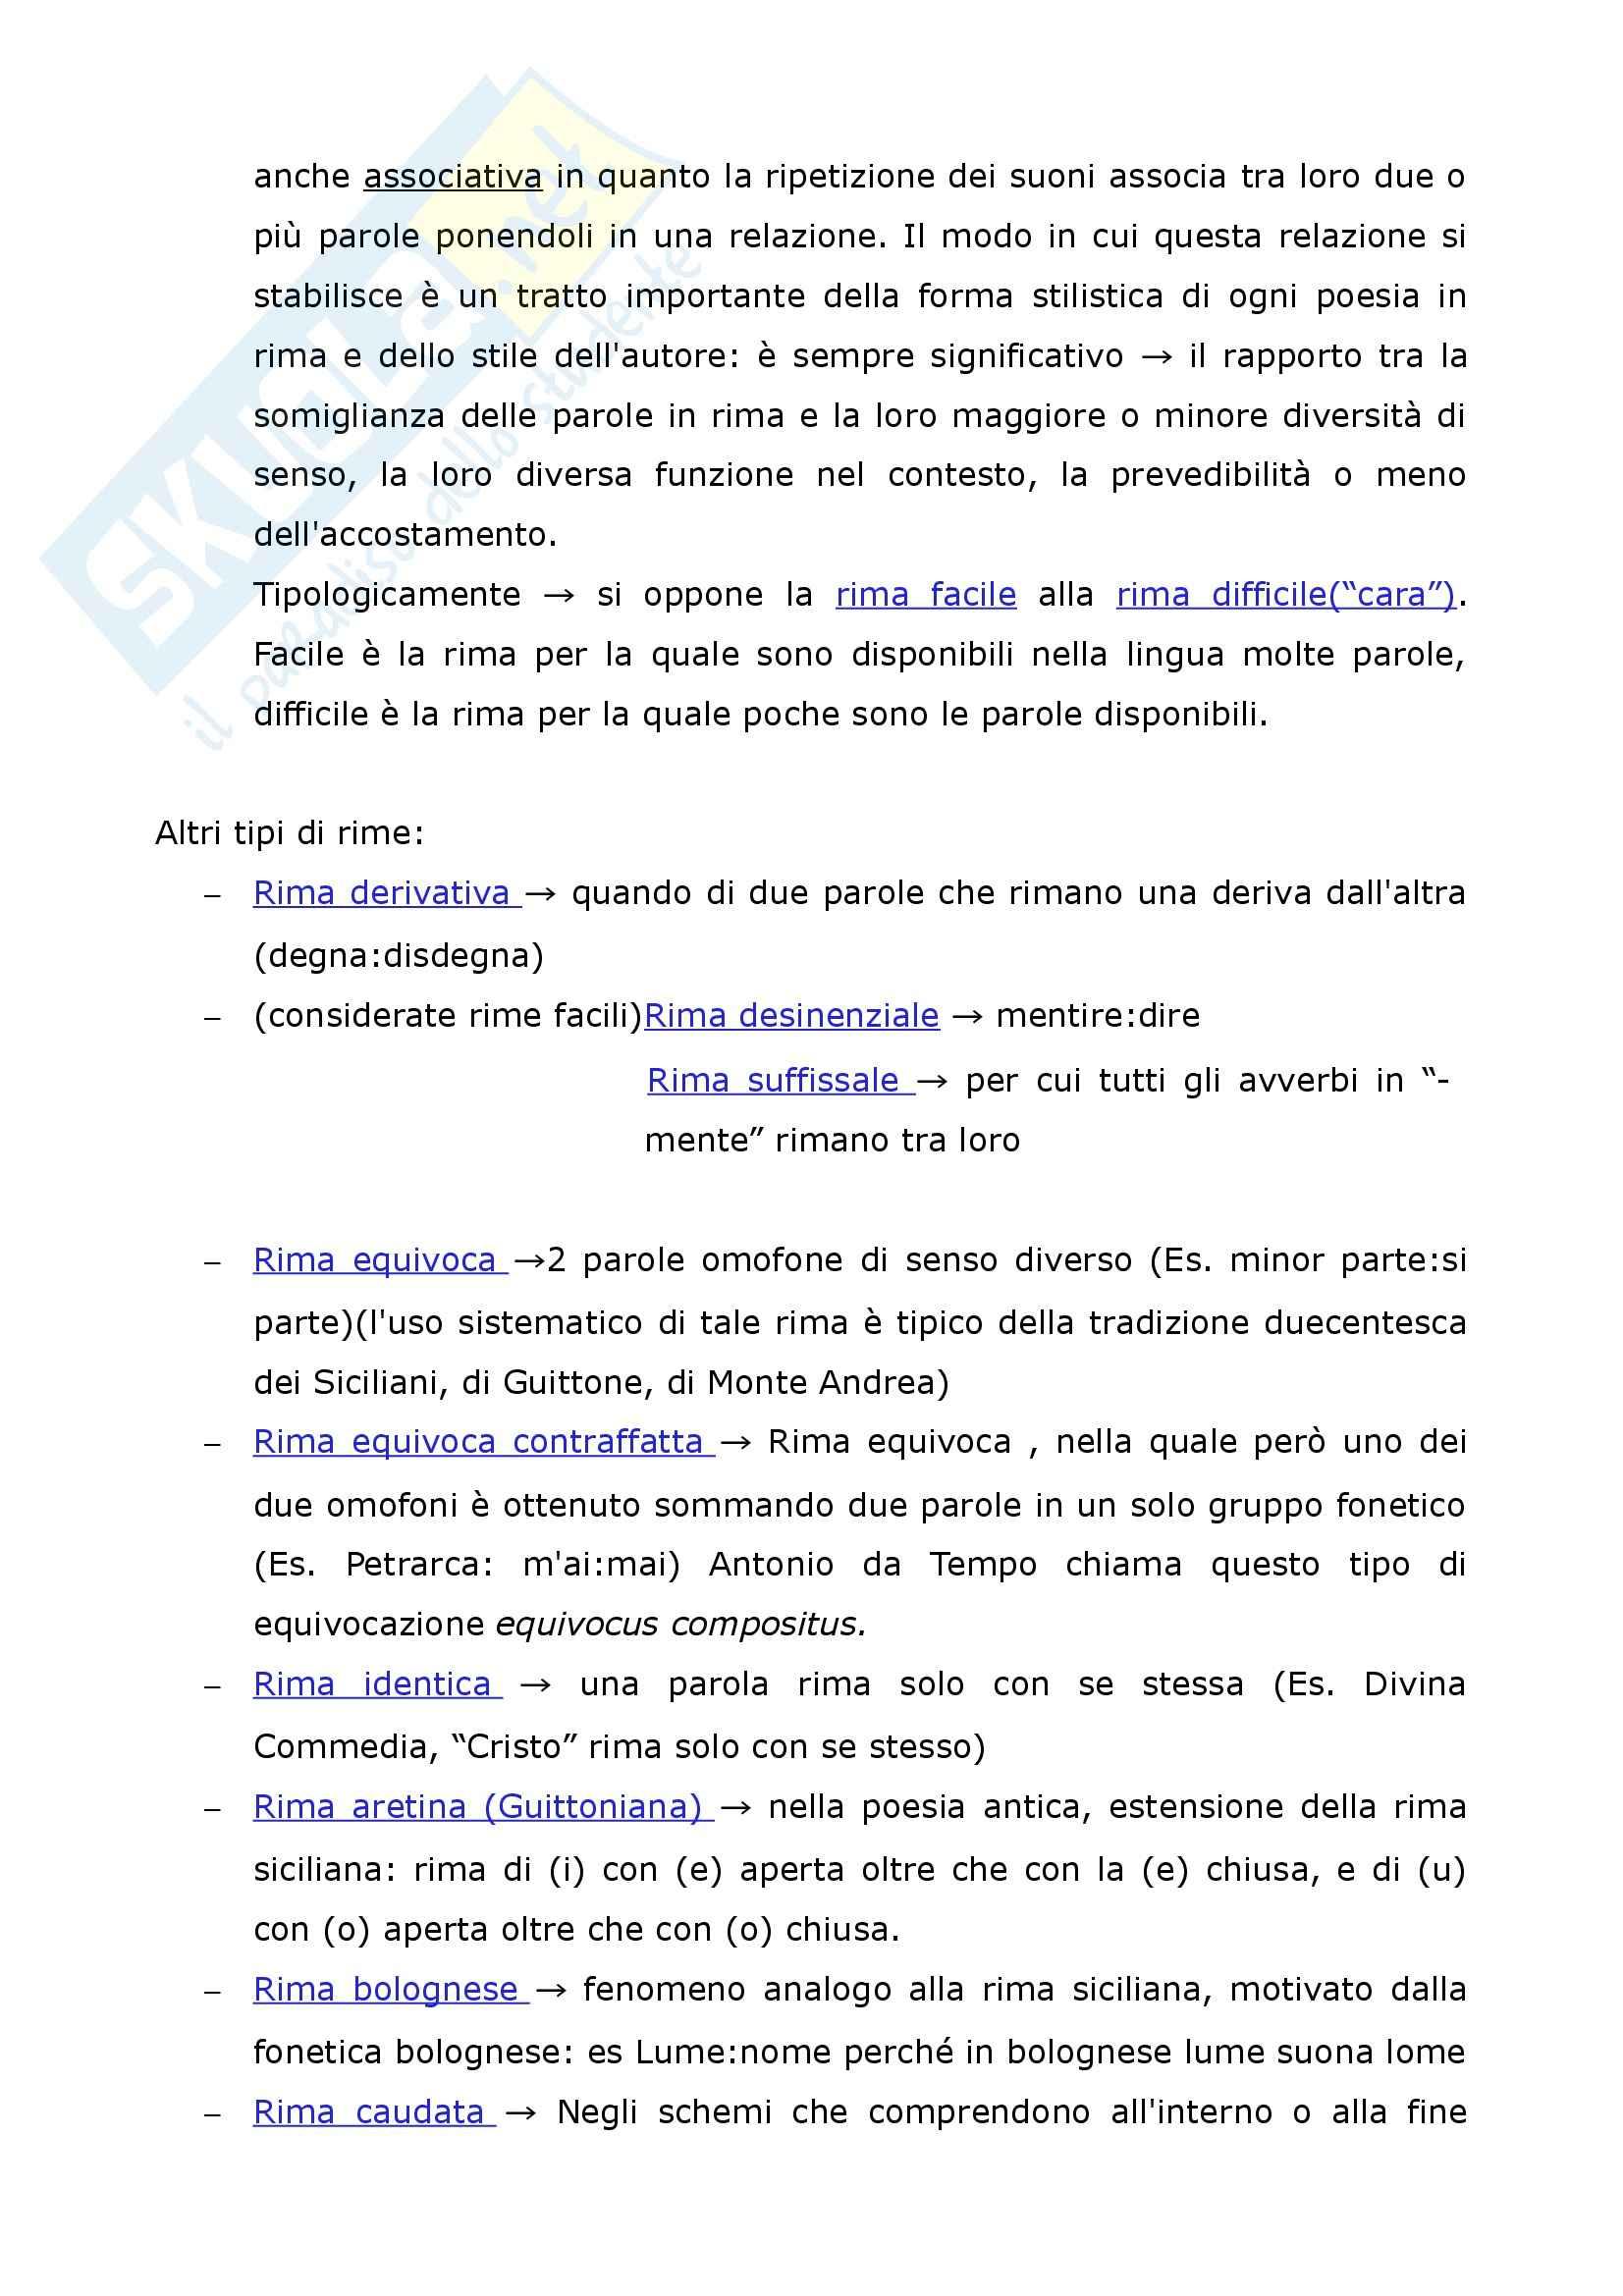 Riassunto esame Filologia italiana, La Metrica italiana, Beltrami, prof. Pancheri Pag. 6